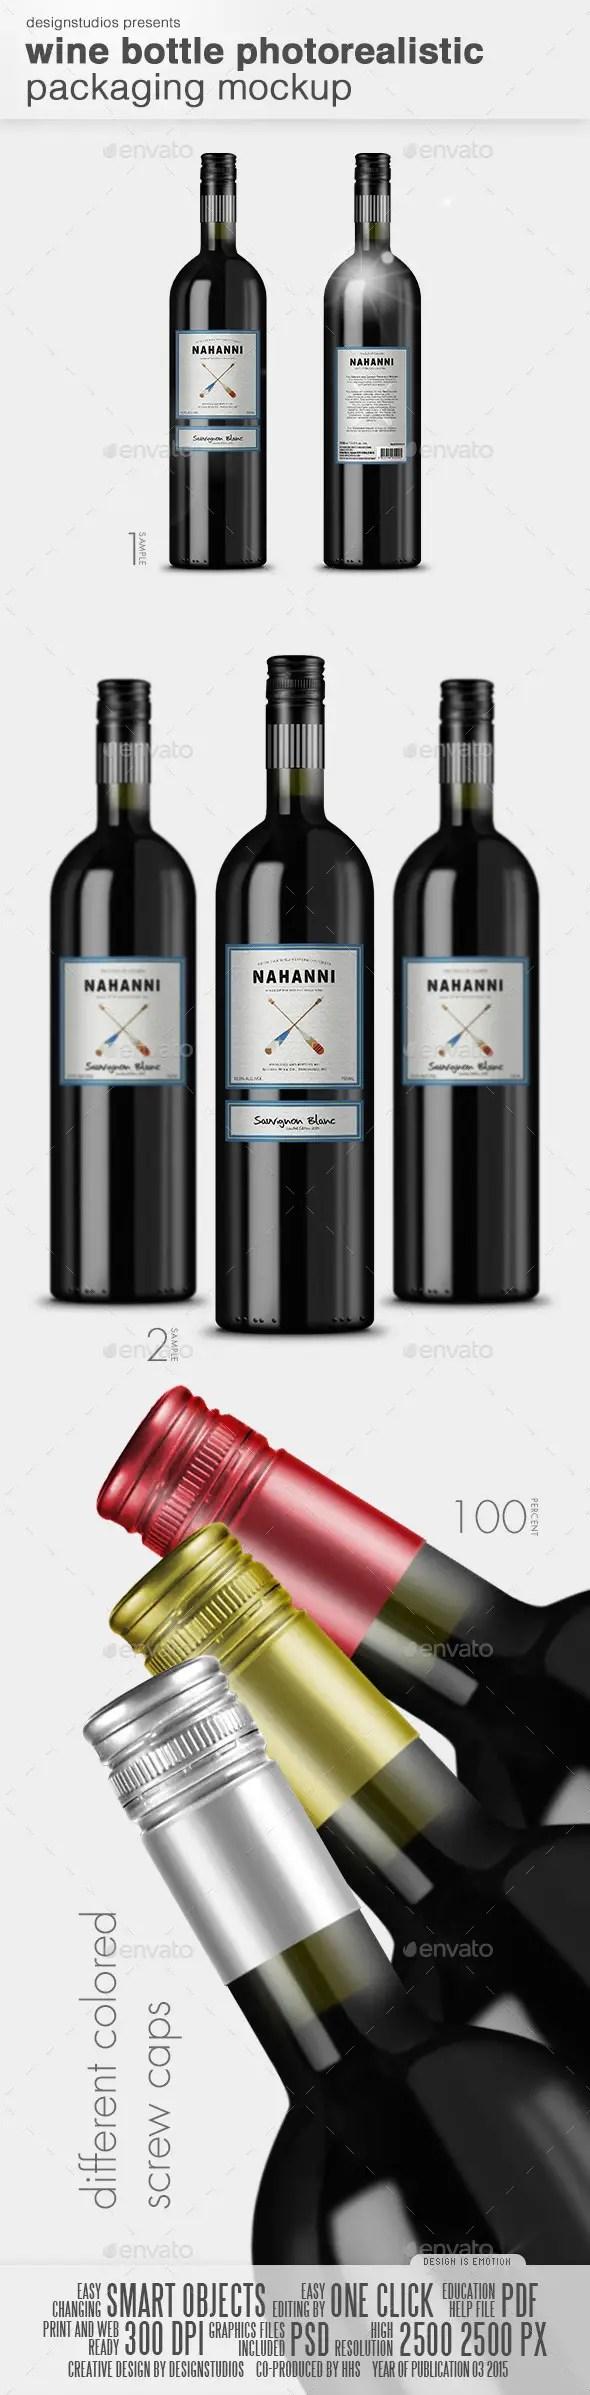 Wine Bottle Photorealistic Packaging Mockup